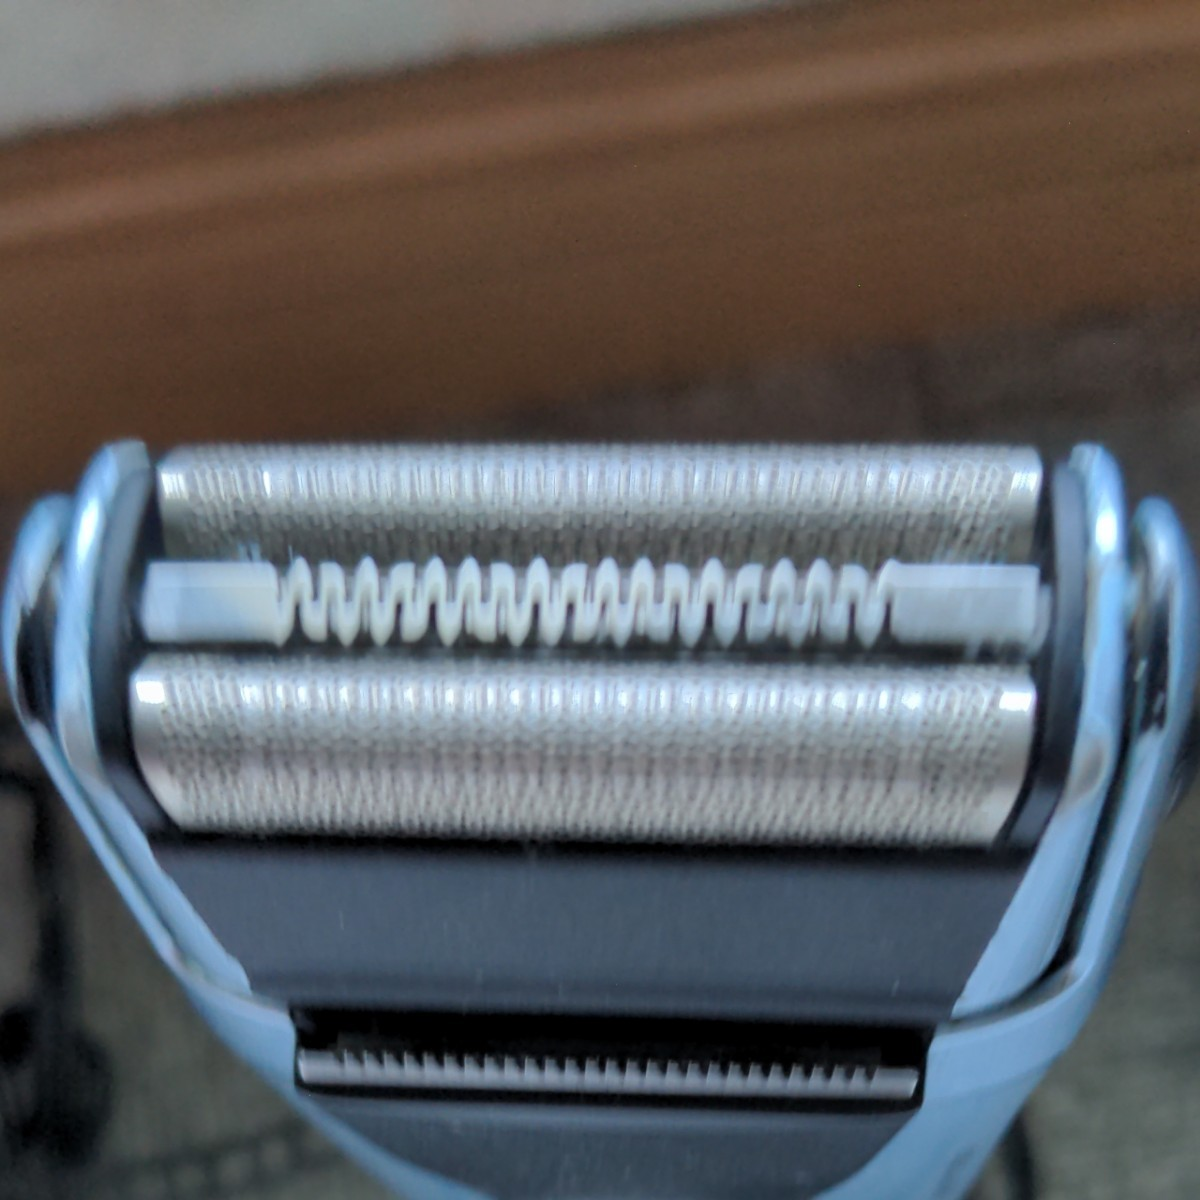 BRAUN メンズシェーバー 充電式